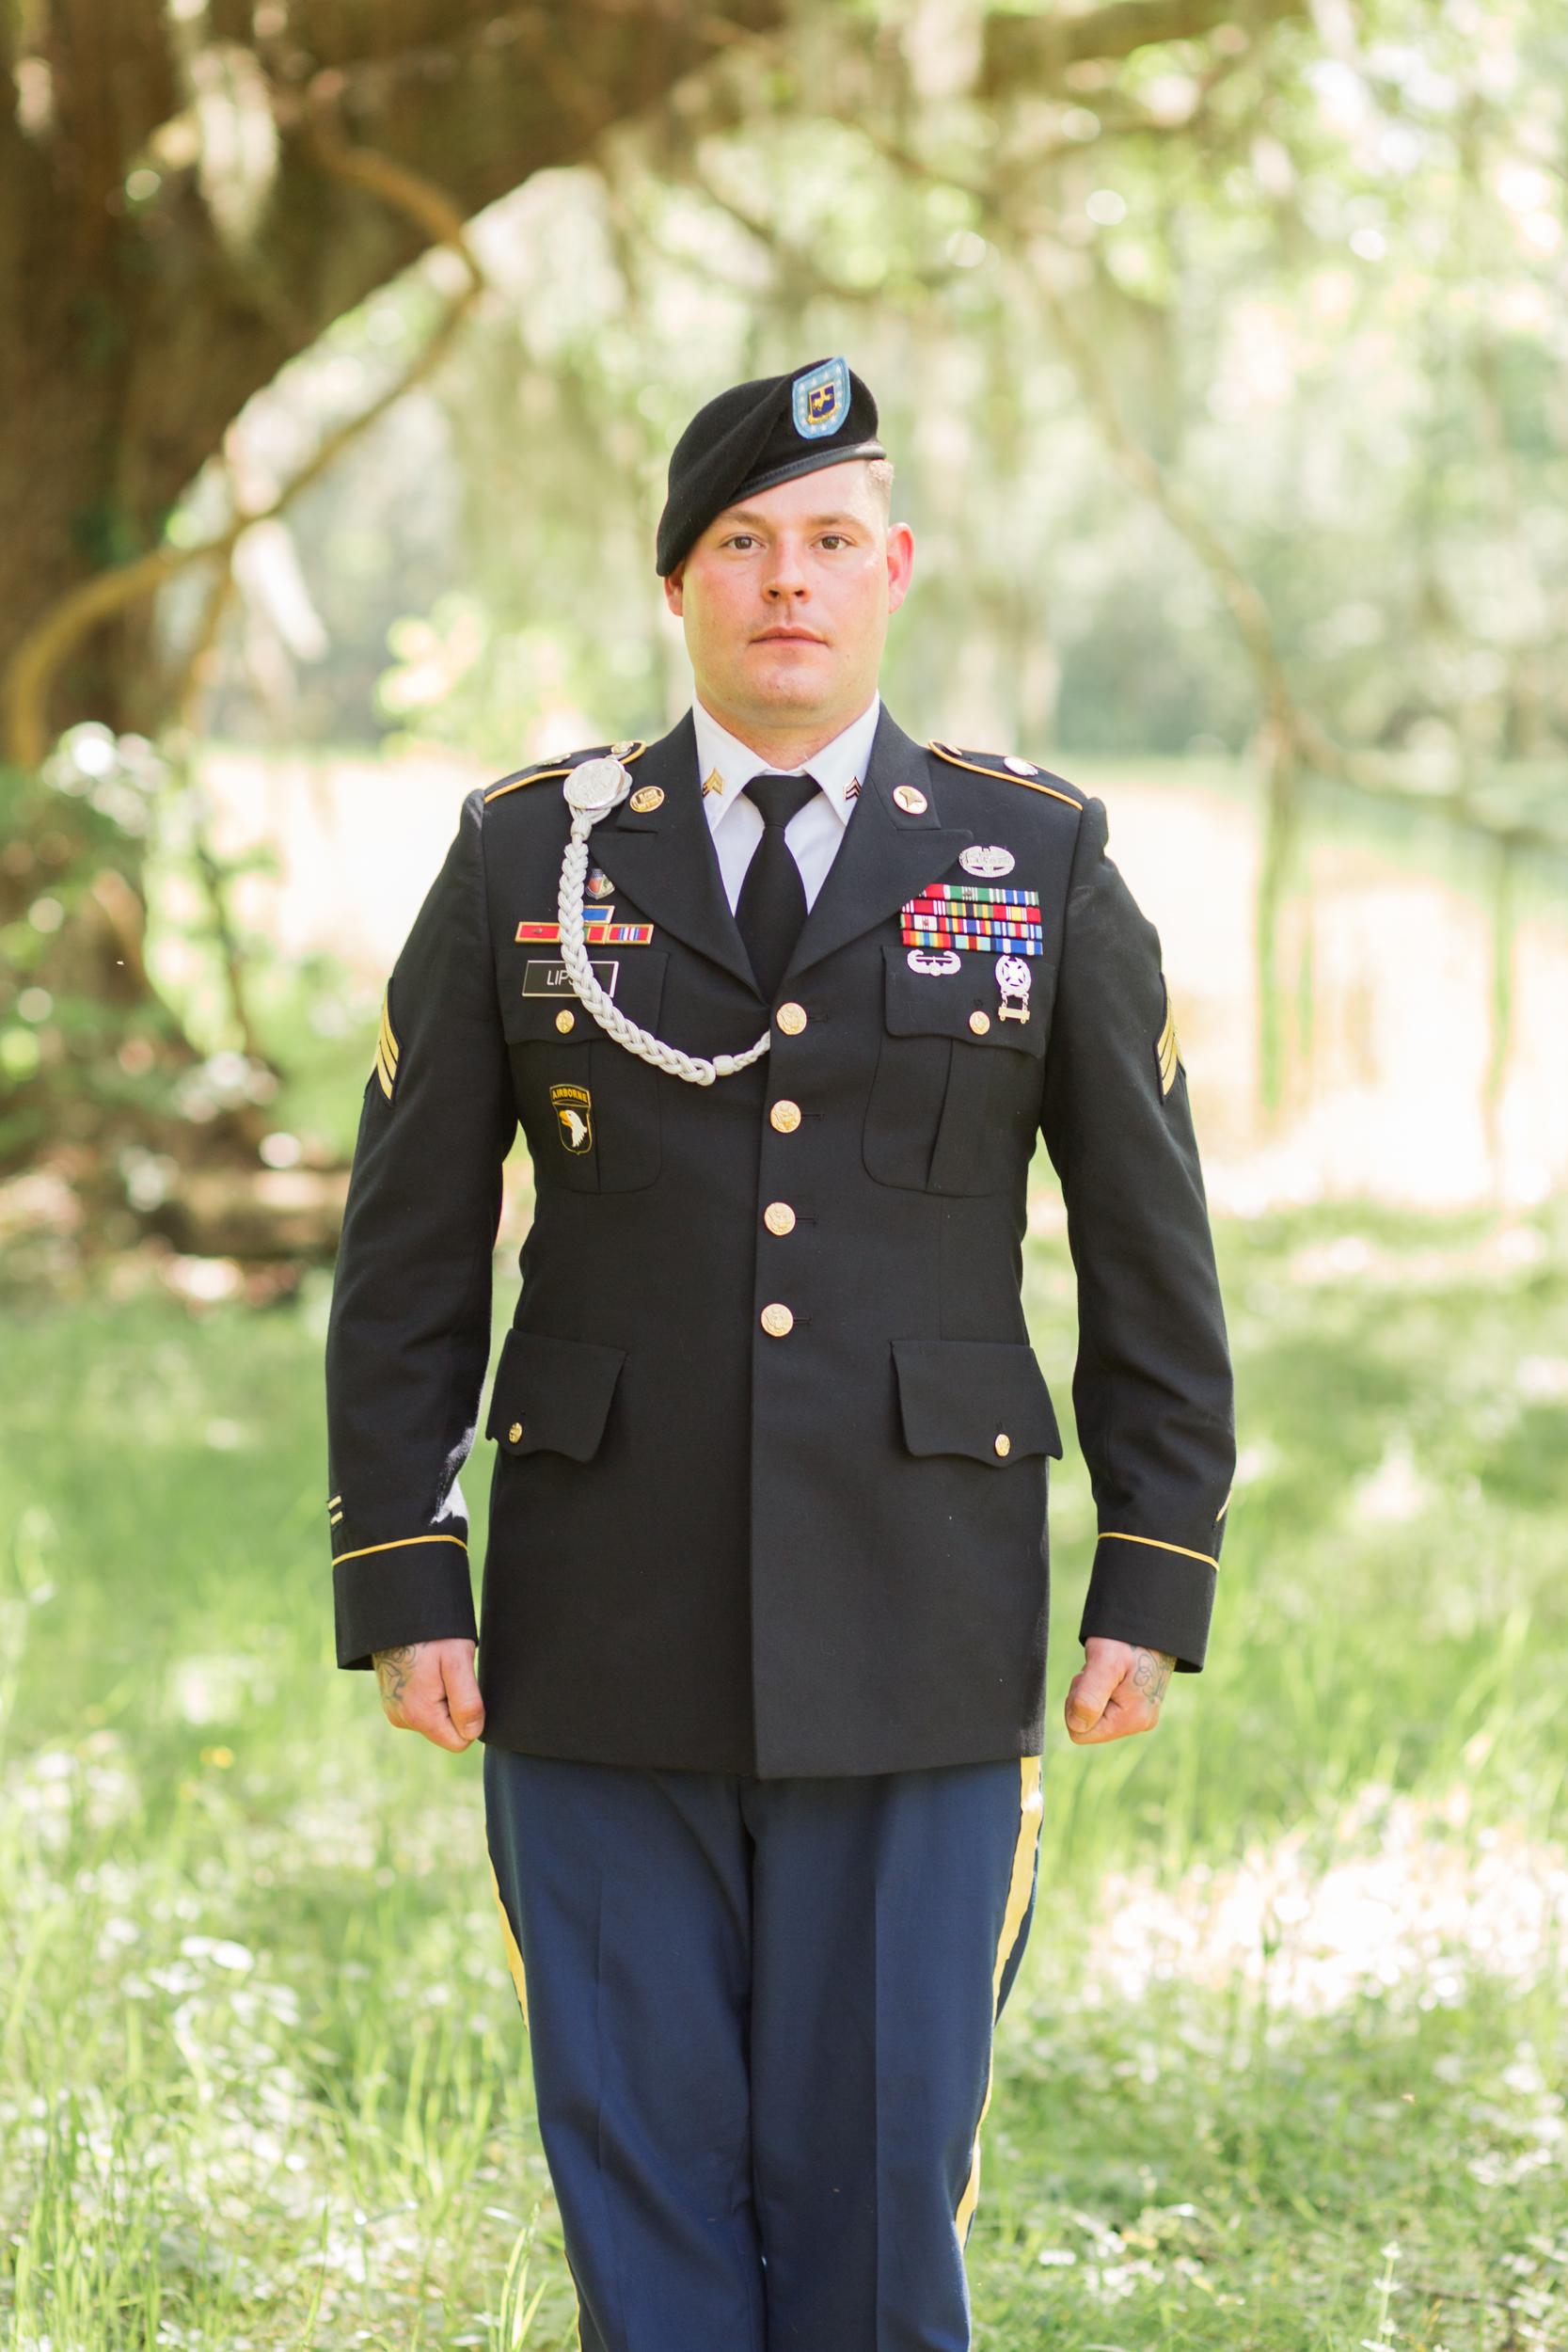 Bronze star recipient Adam Lipski in his military uniform for his Savannah GA wedding